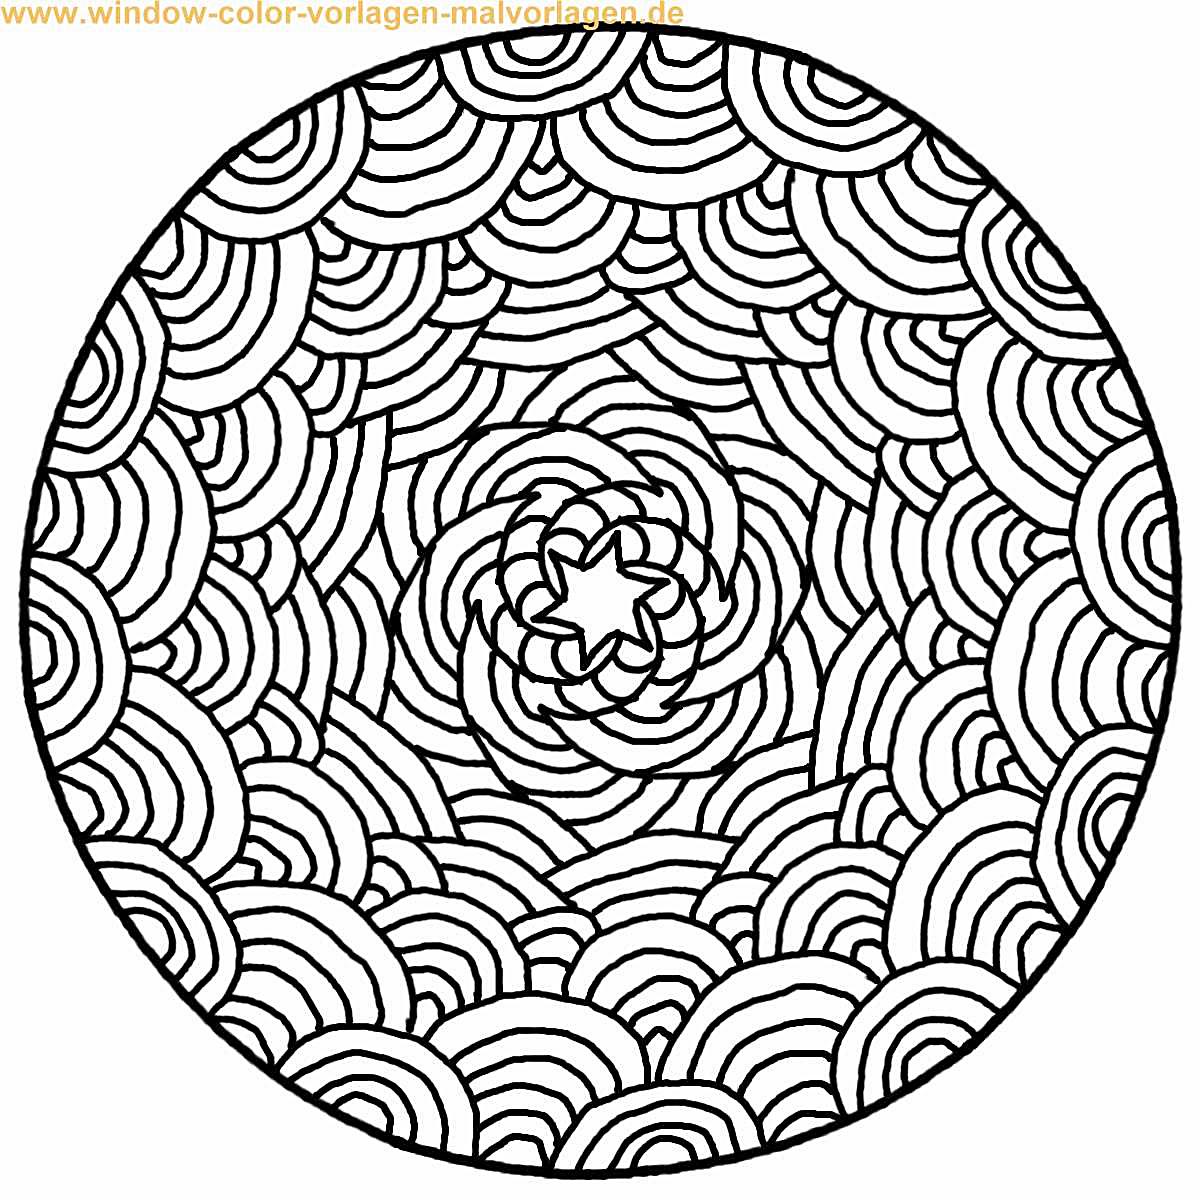 Mandala 007 | colouring pages | Pinterest | Mandala malvorlagen ...